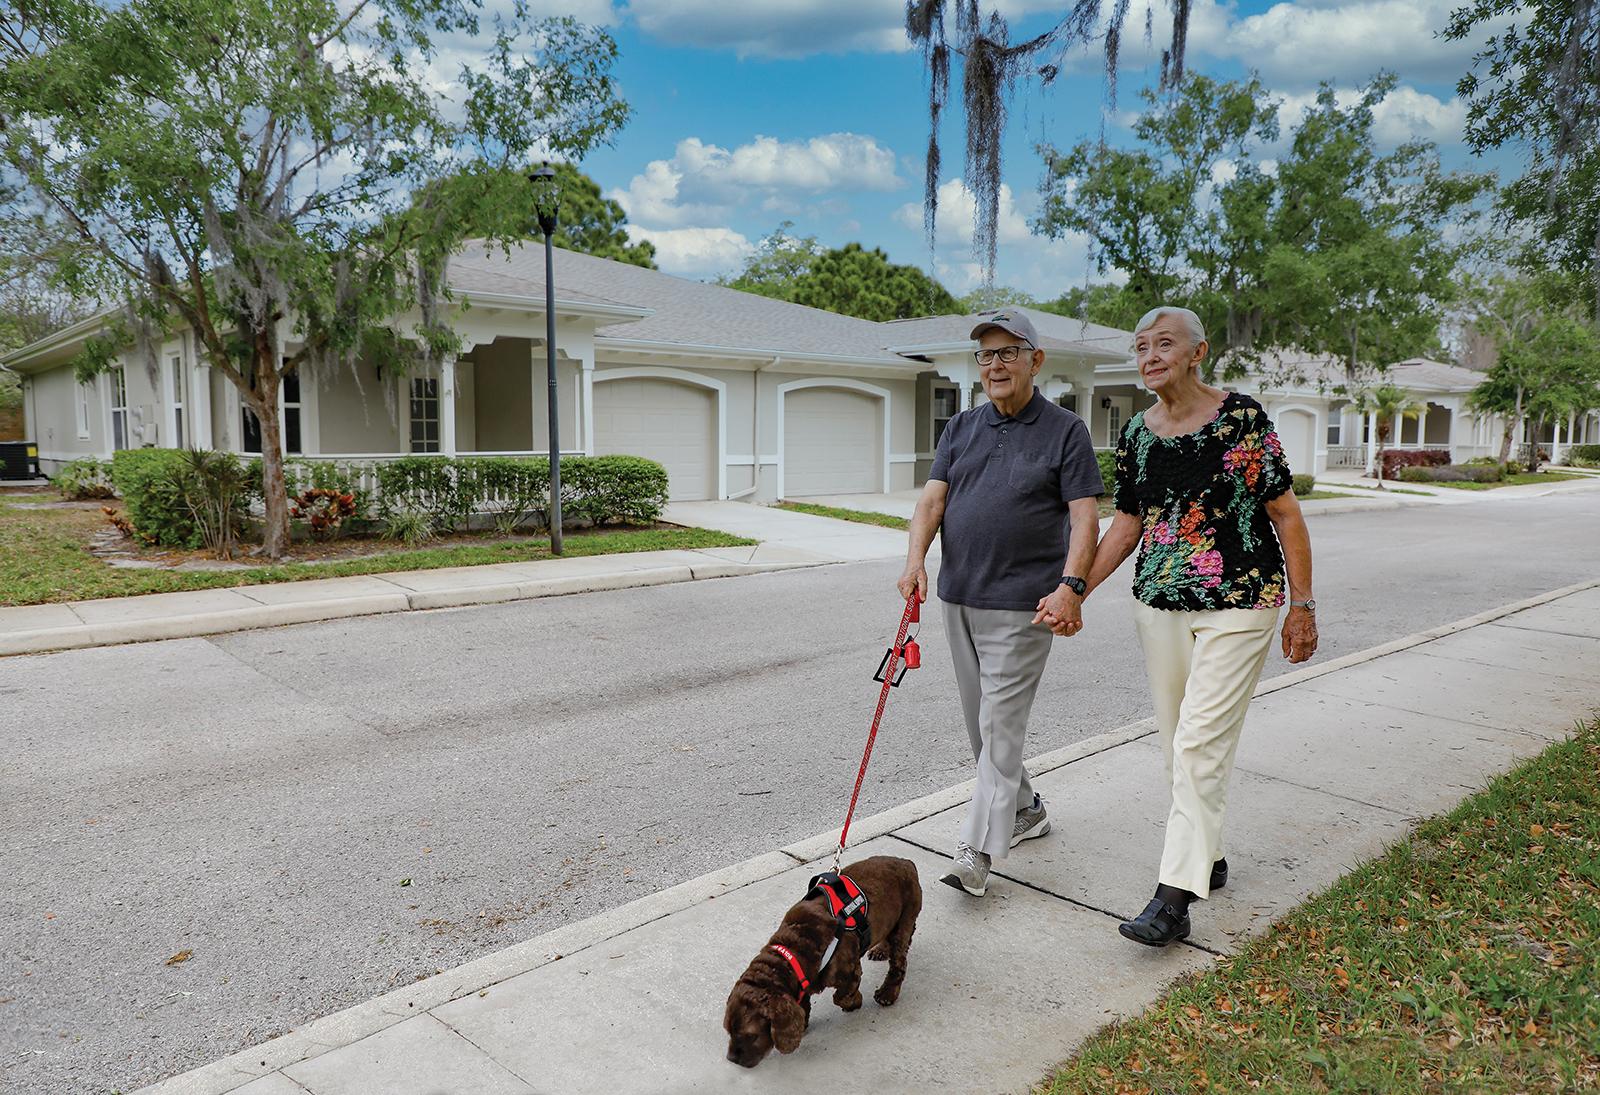 couple walking dog down street by villas